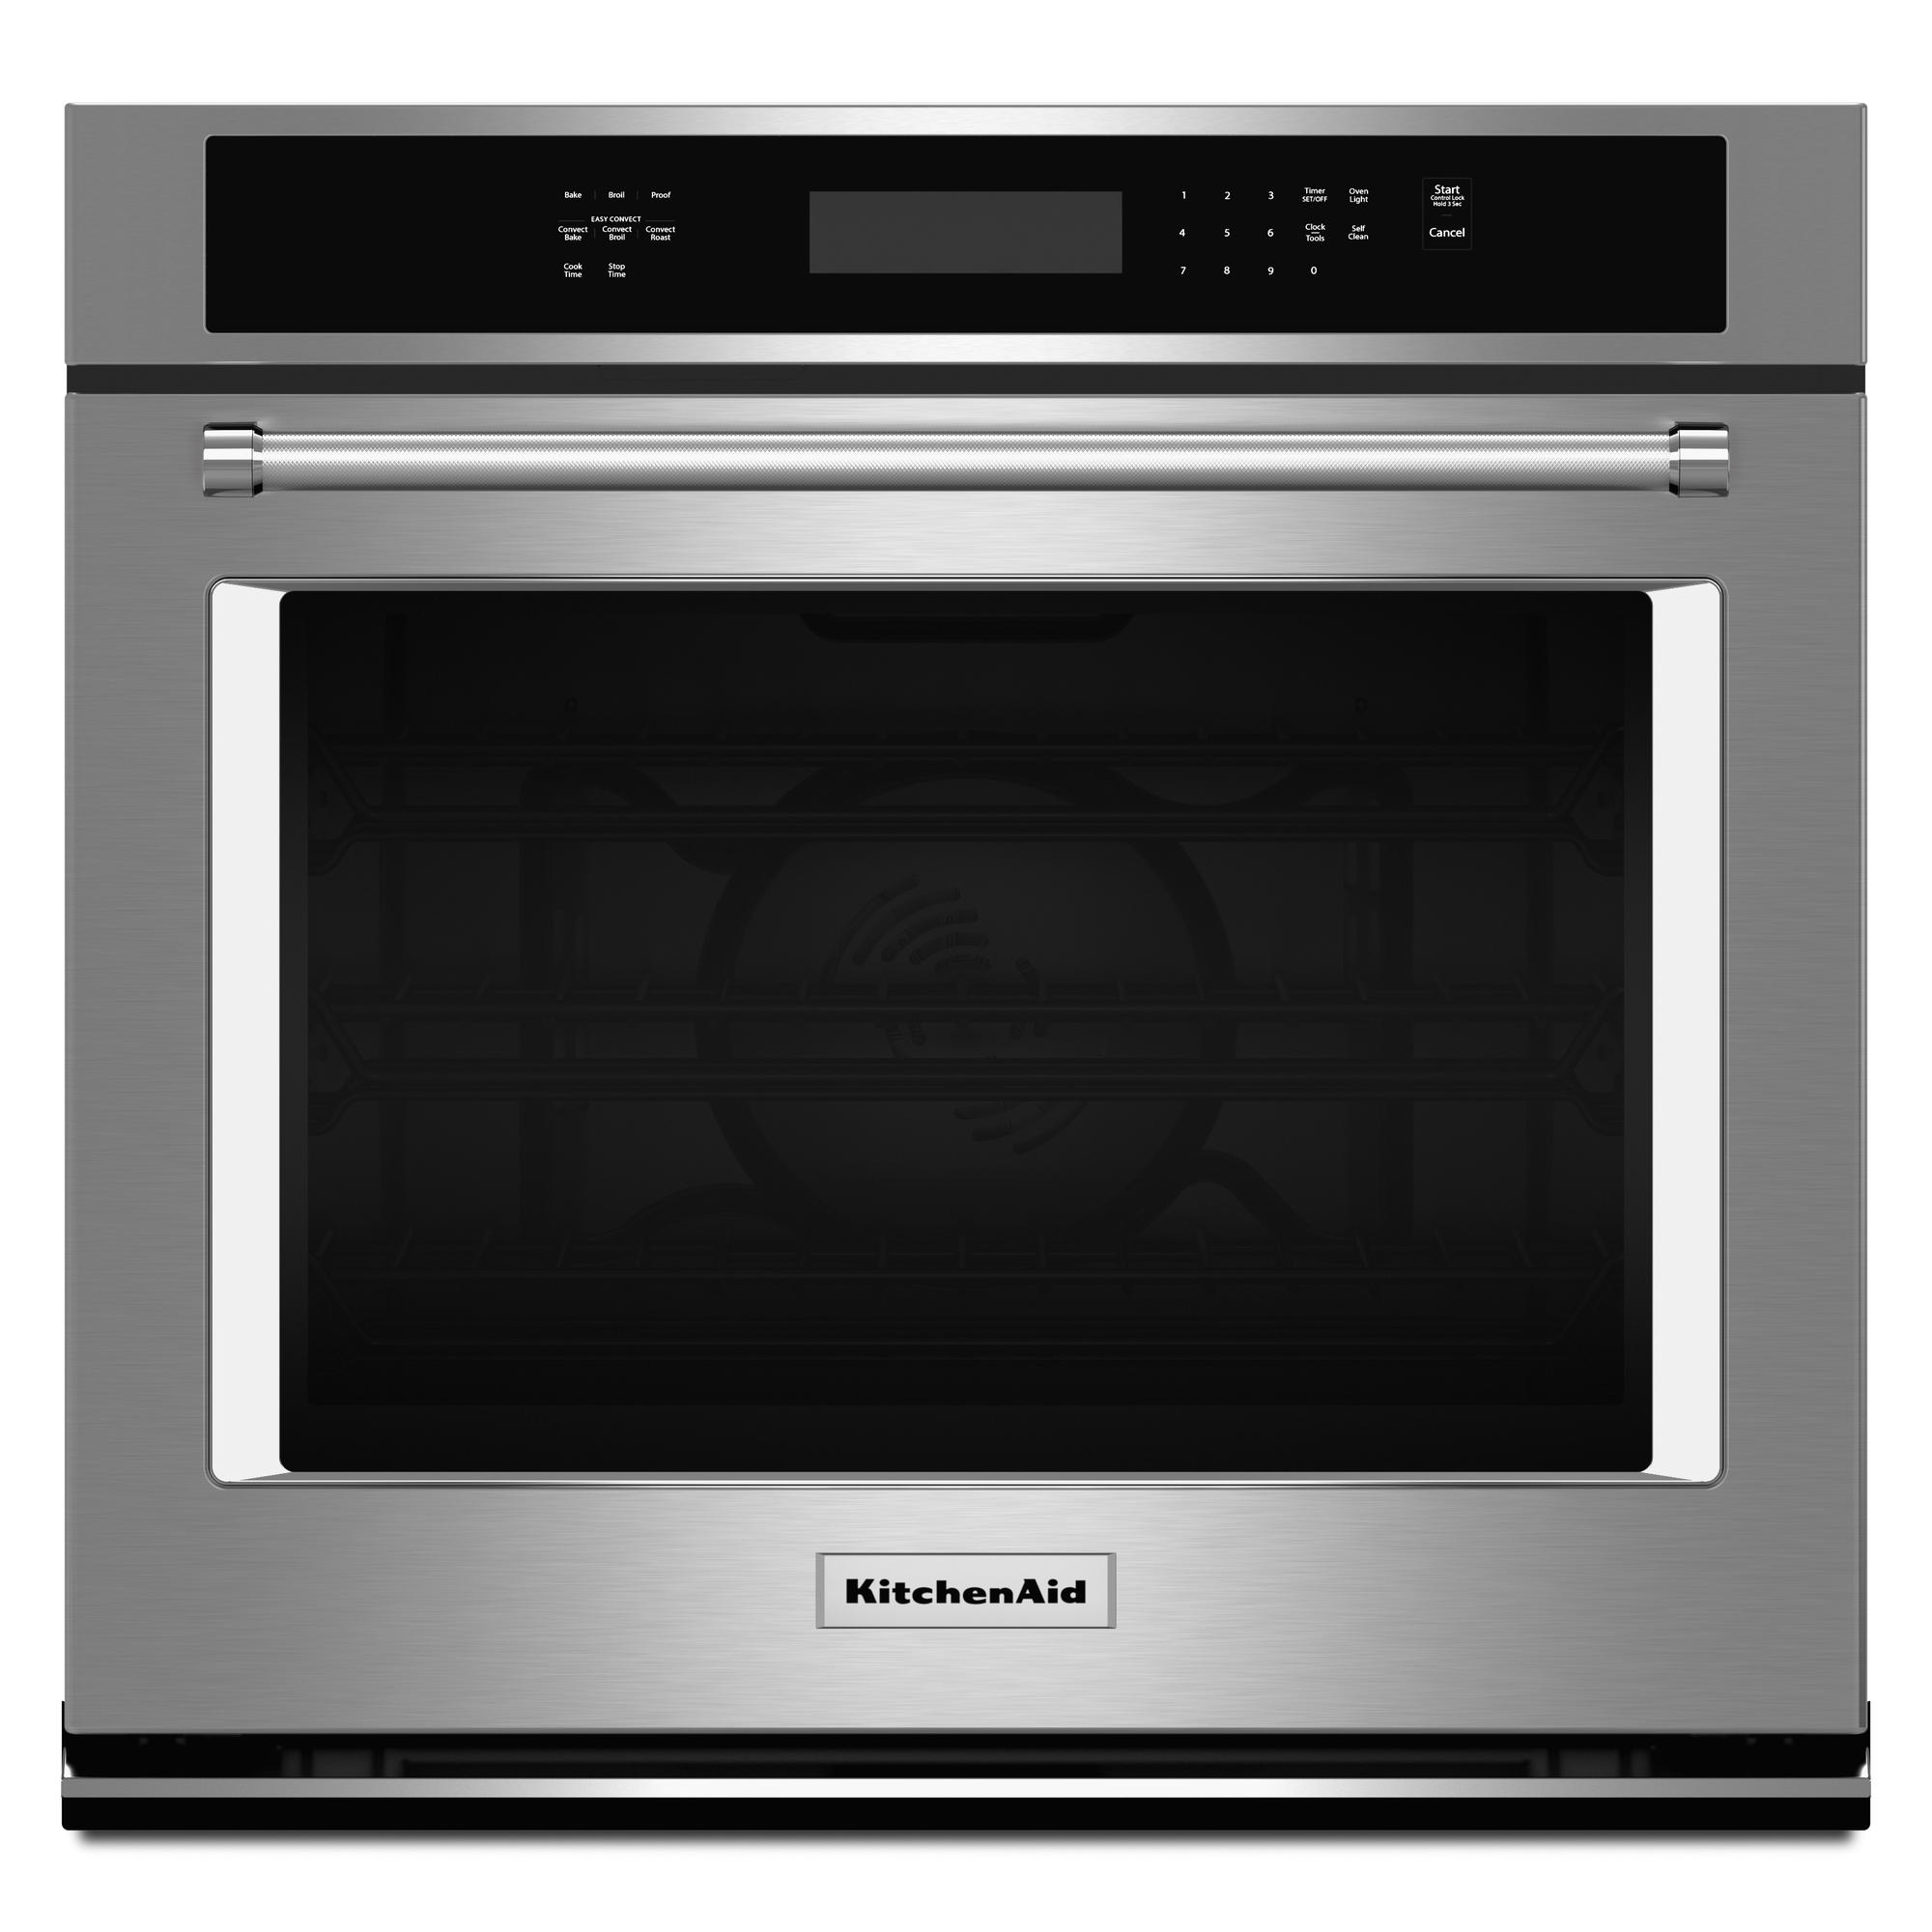 KitchenAid Microwave Convection Oven